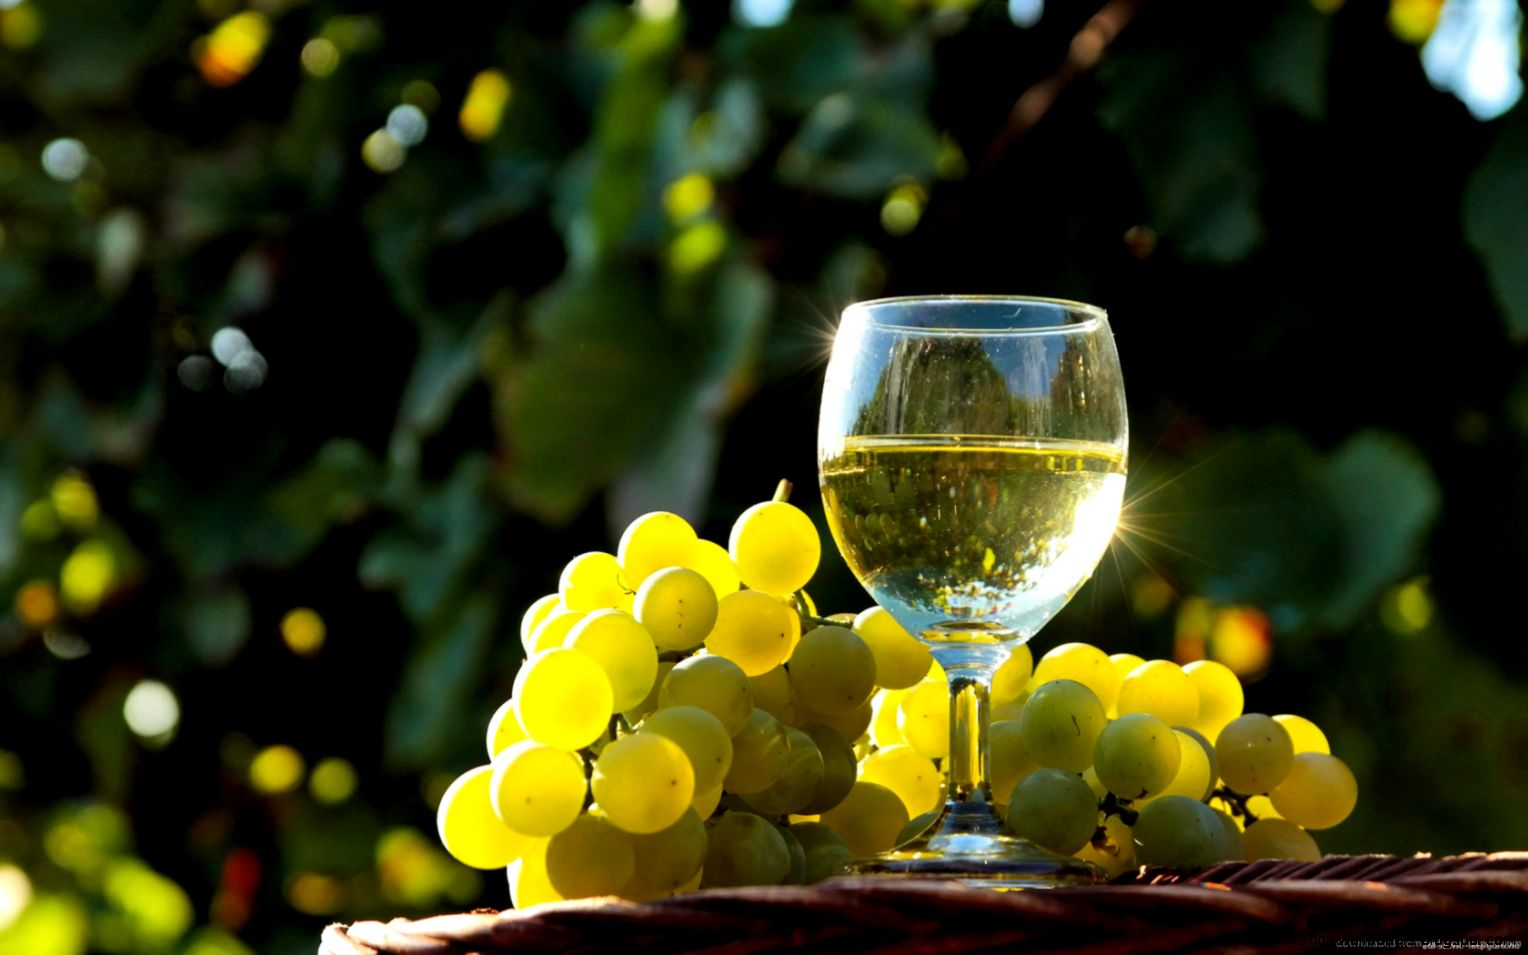 Download 1680x1050 Glass Of White Wine Wallpaper